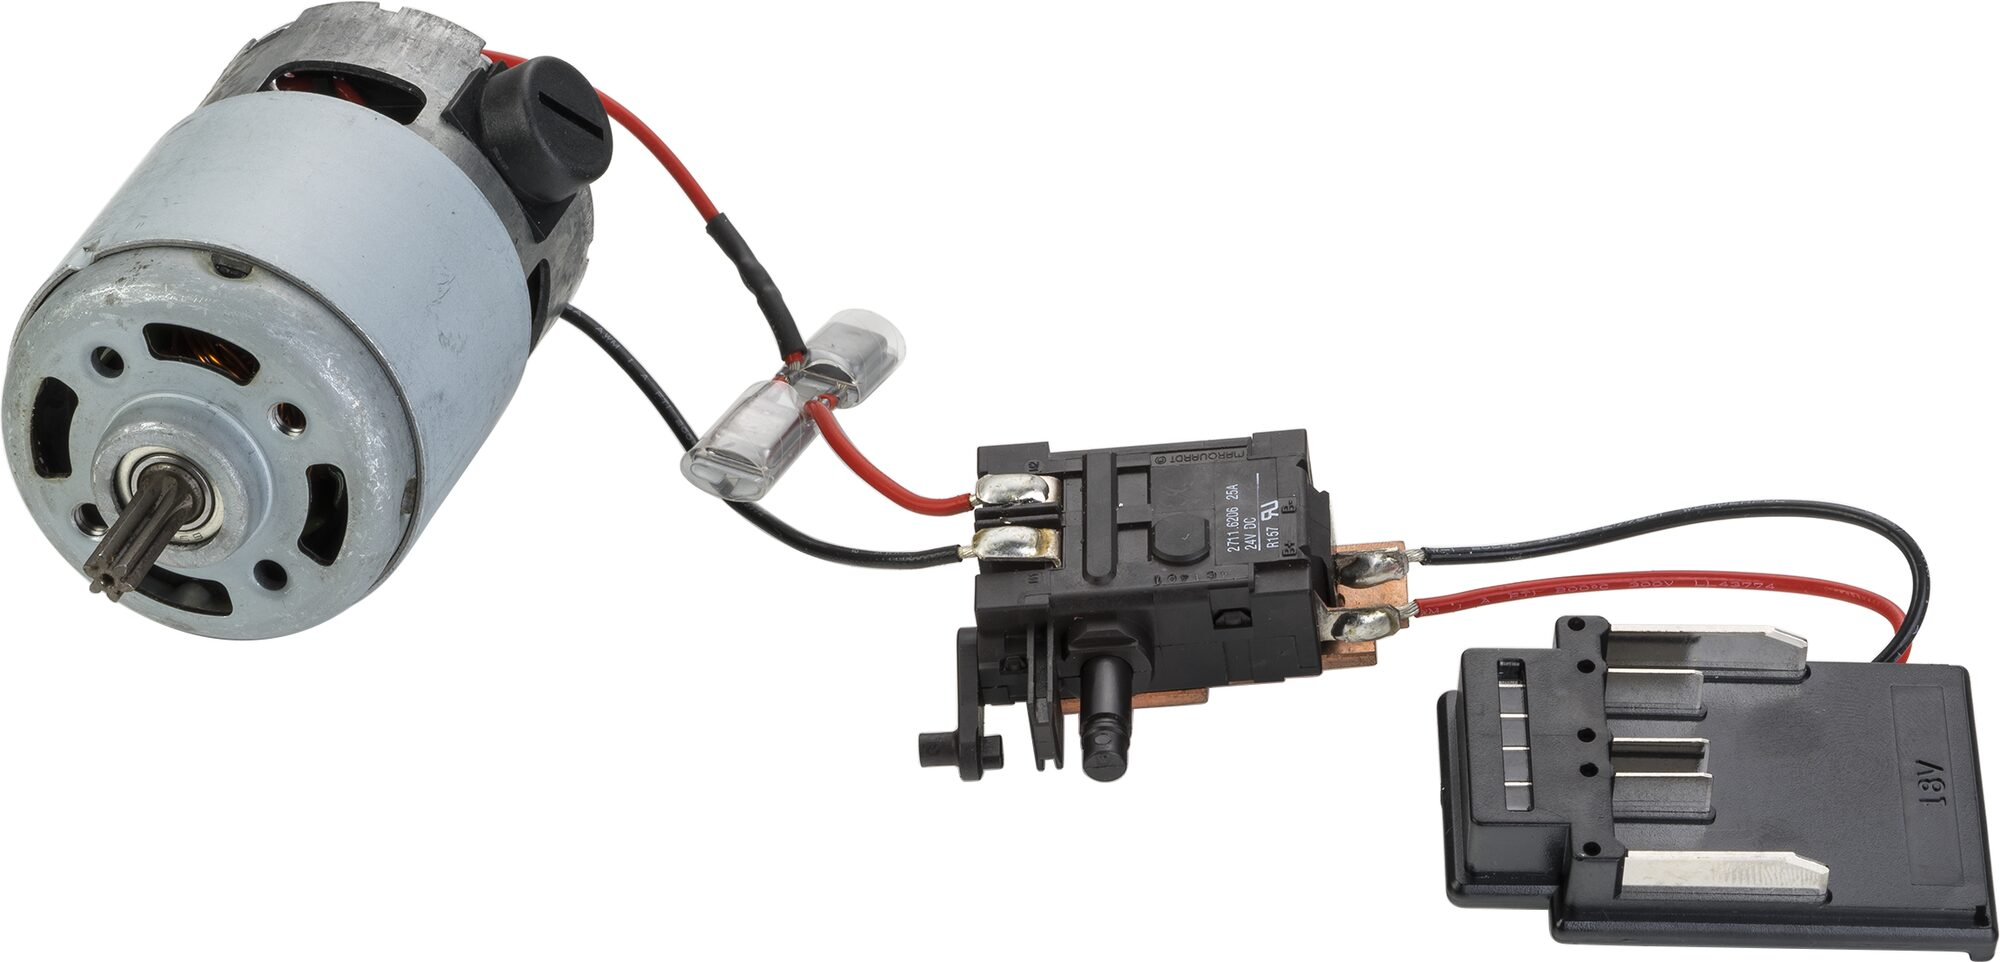 HAZET Elektronik-Betätigungsknopf 9212N-1-09/5